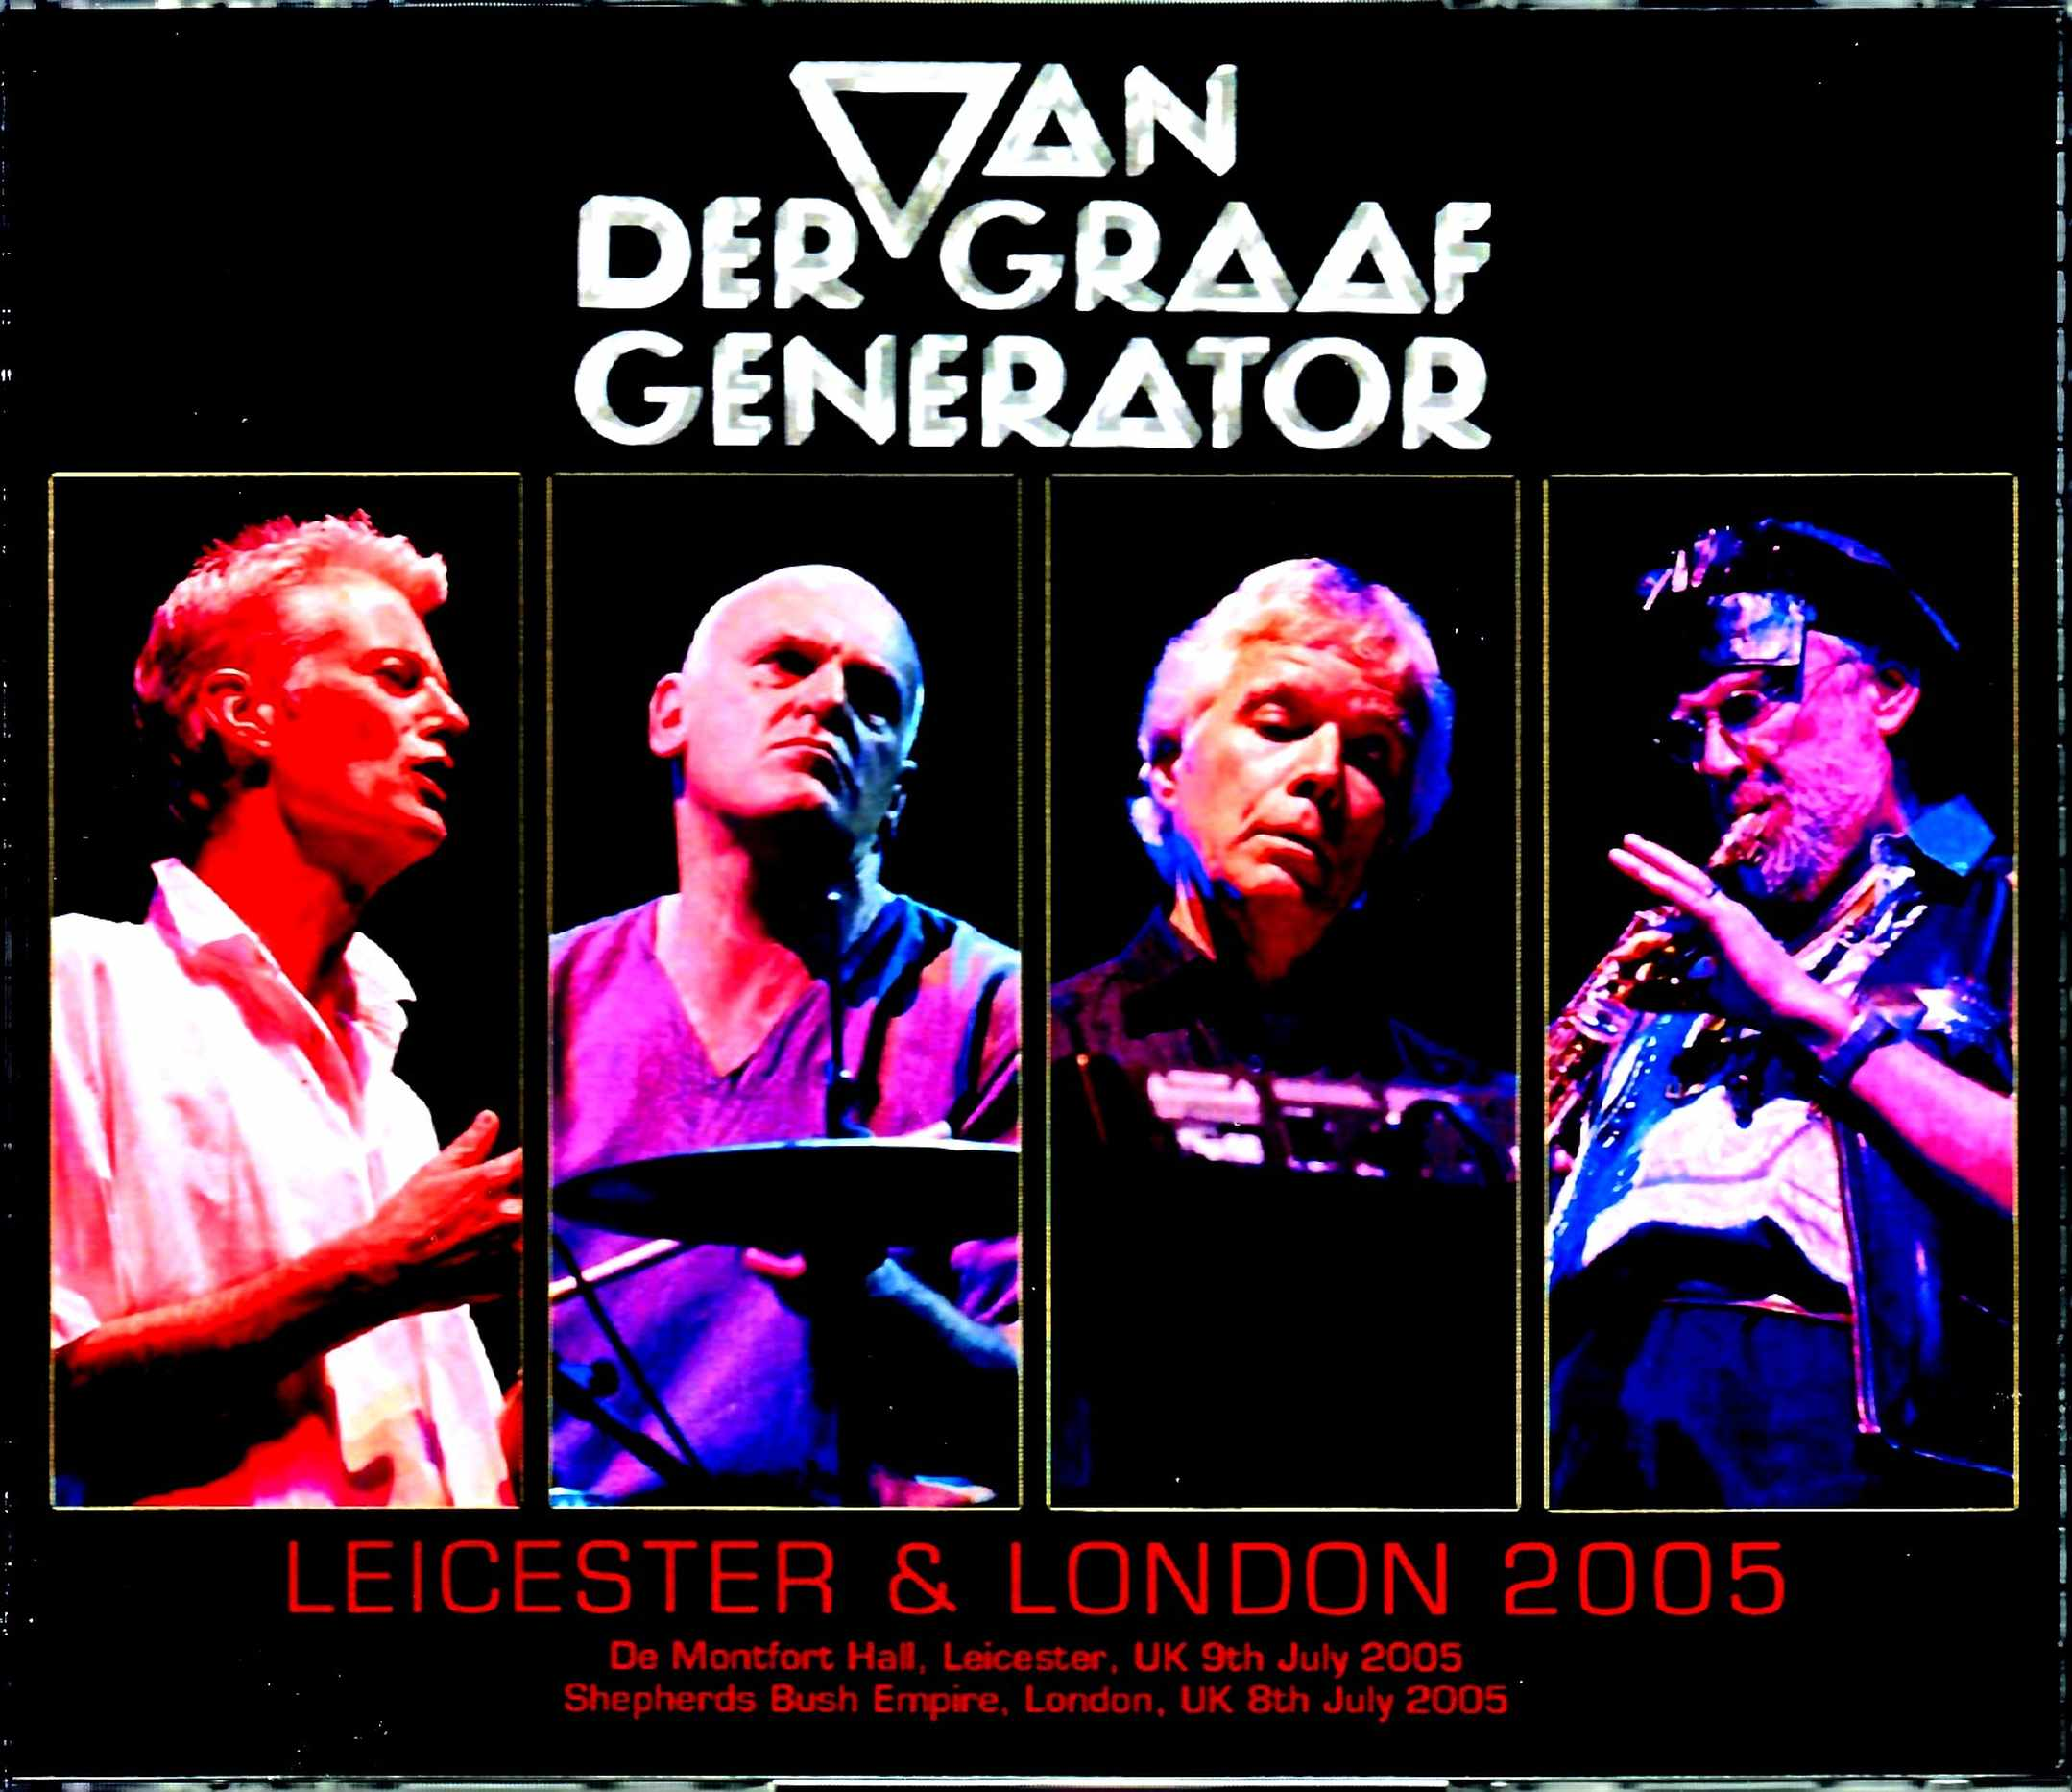 Van Der Graaf Generator ヴァン・ダー・グラーフ・ジェネレーター/London,UK 2005 & more